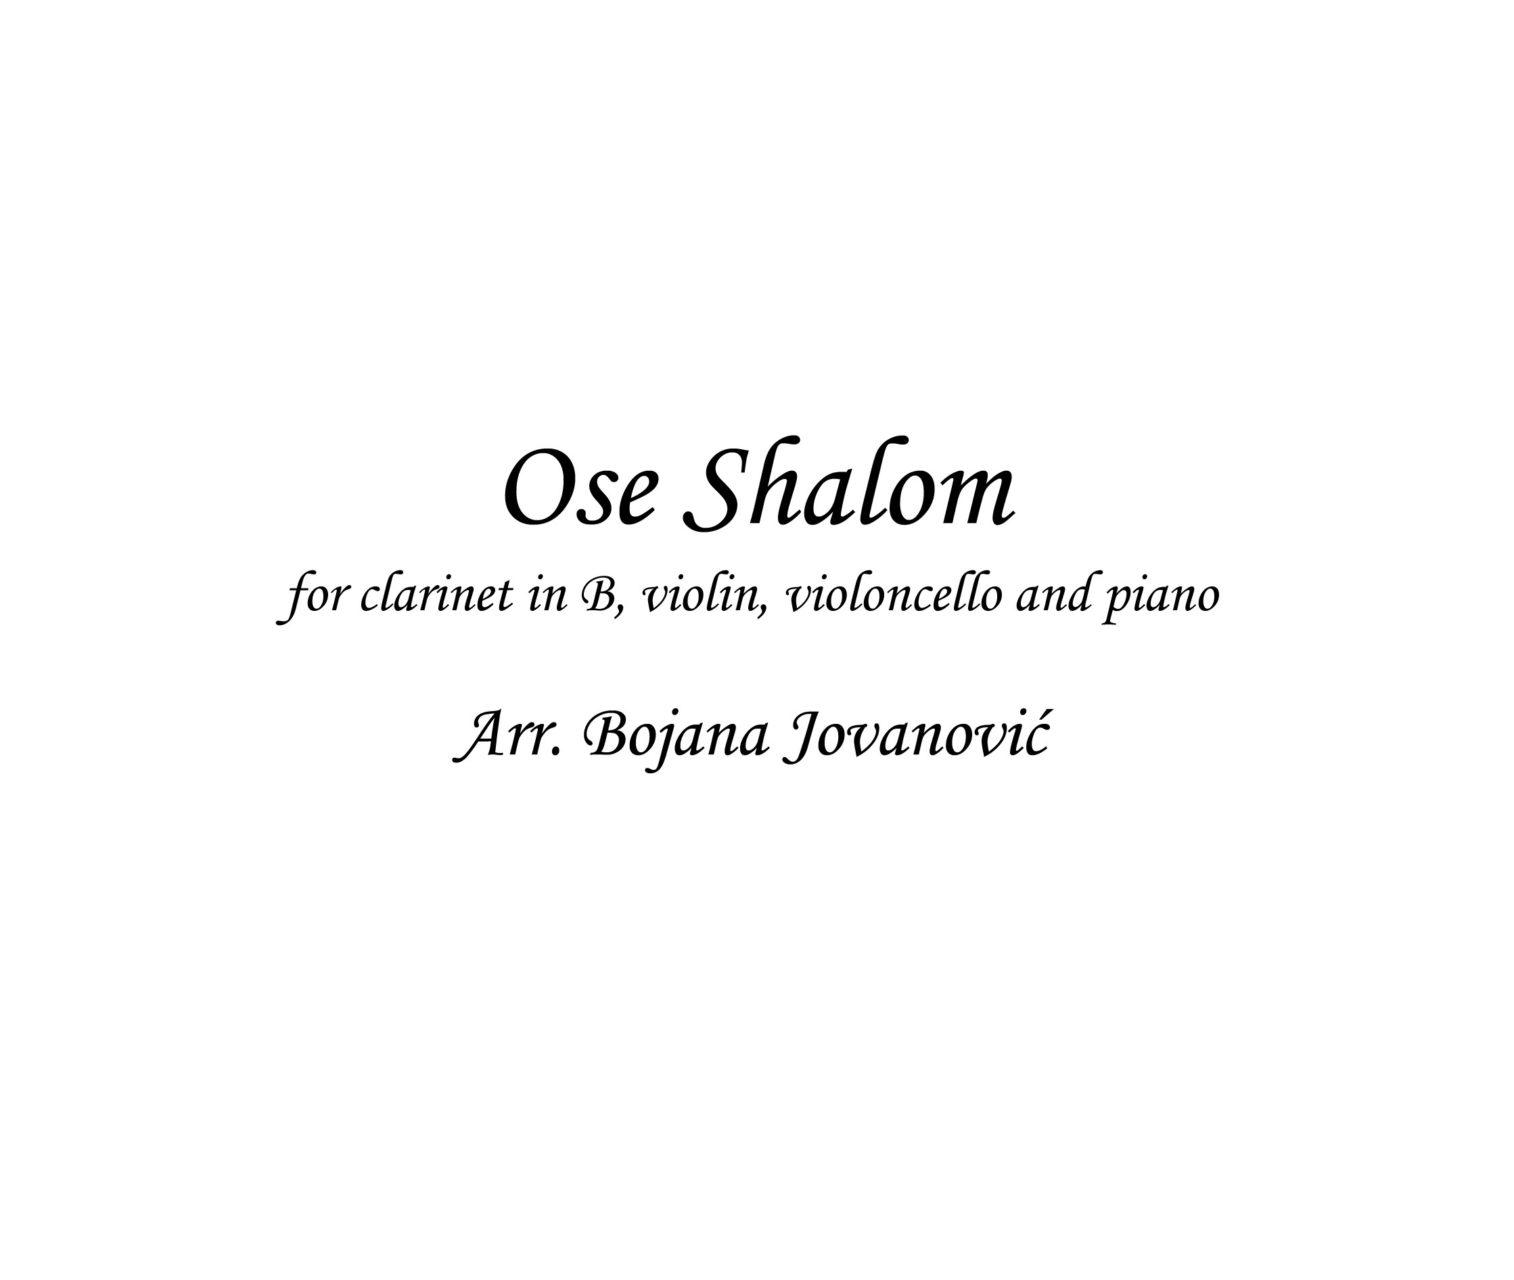 Ose Shalom (Jewish music)